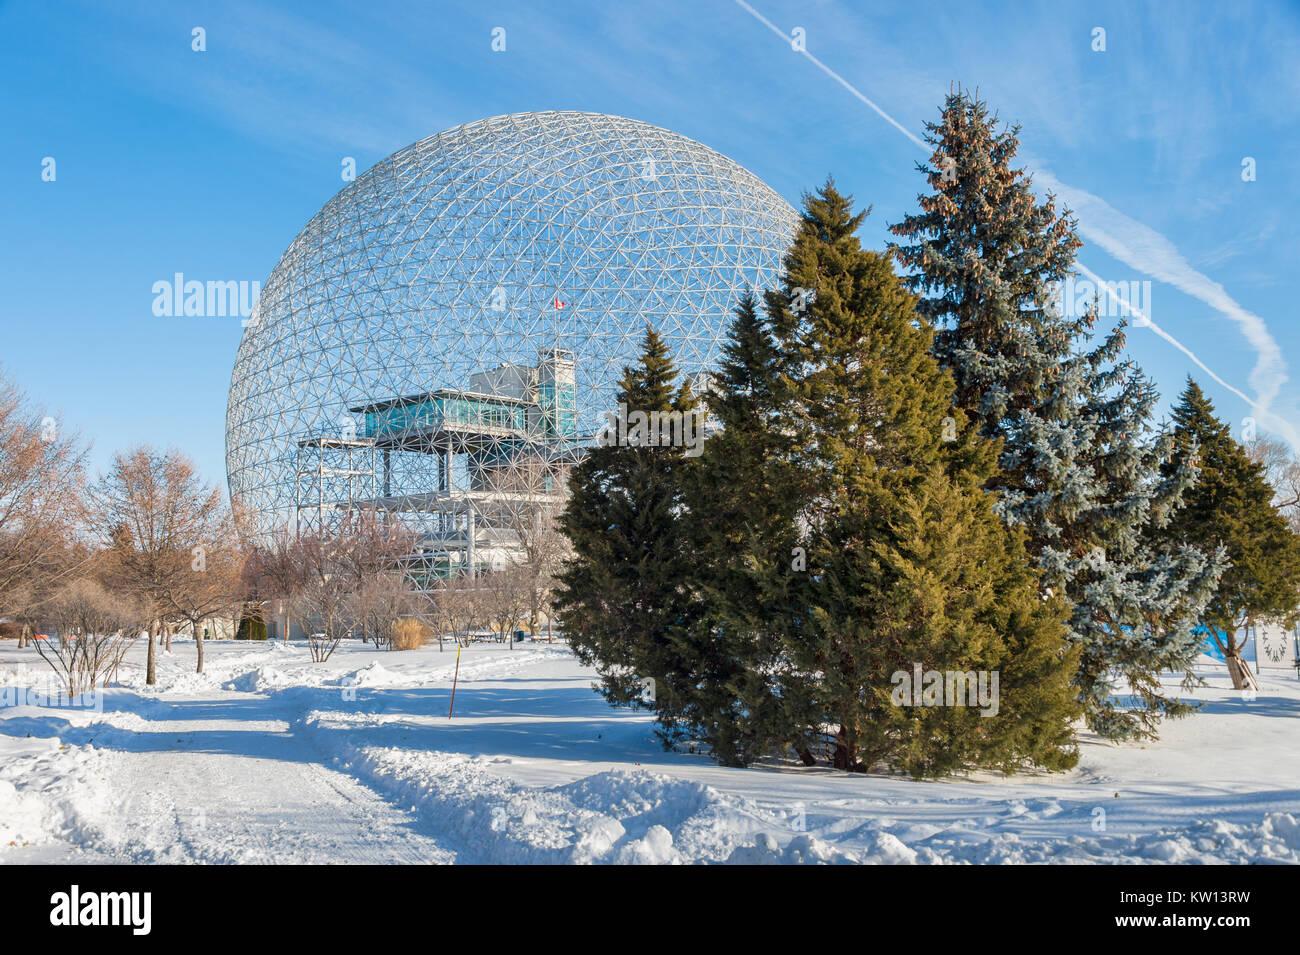 Montreal, CA - 28. Dezember 2017: Biosphäre in Parc Jean Drapeau, im Winter Stockbild